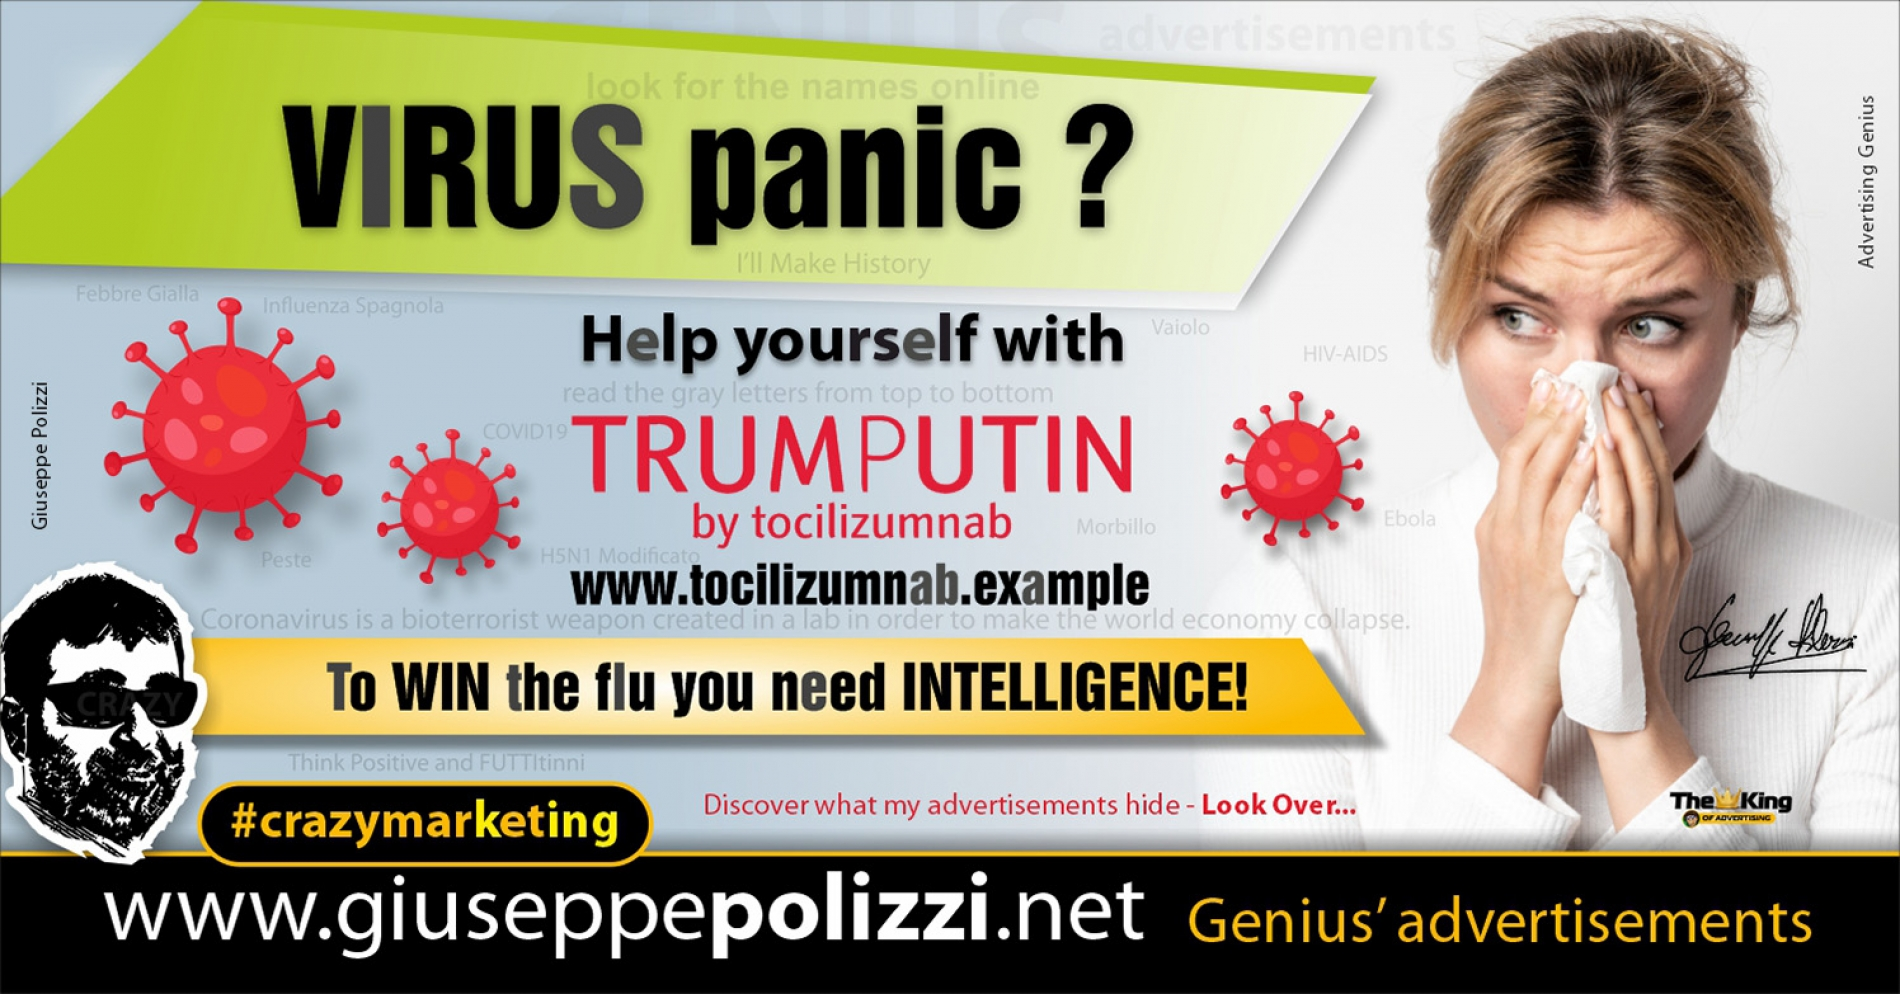 Giuseppe Polizzi Crazymarketing Virus Panic advertisements